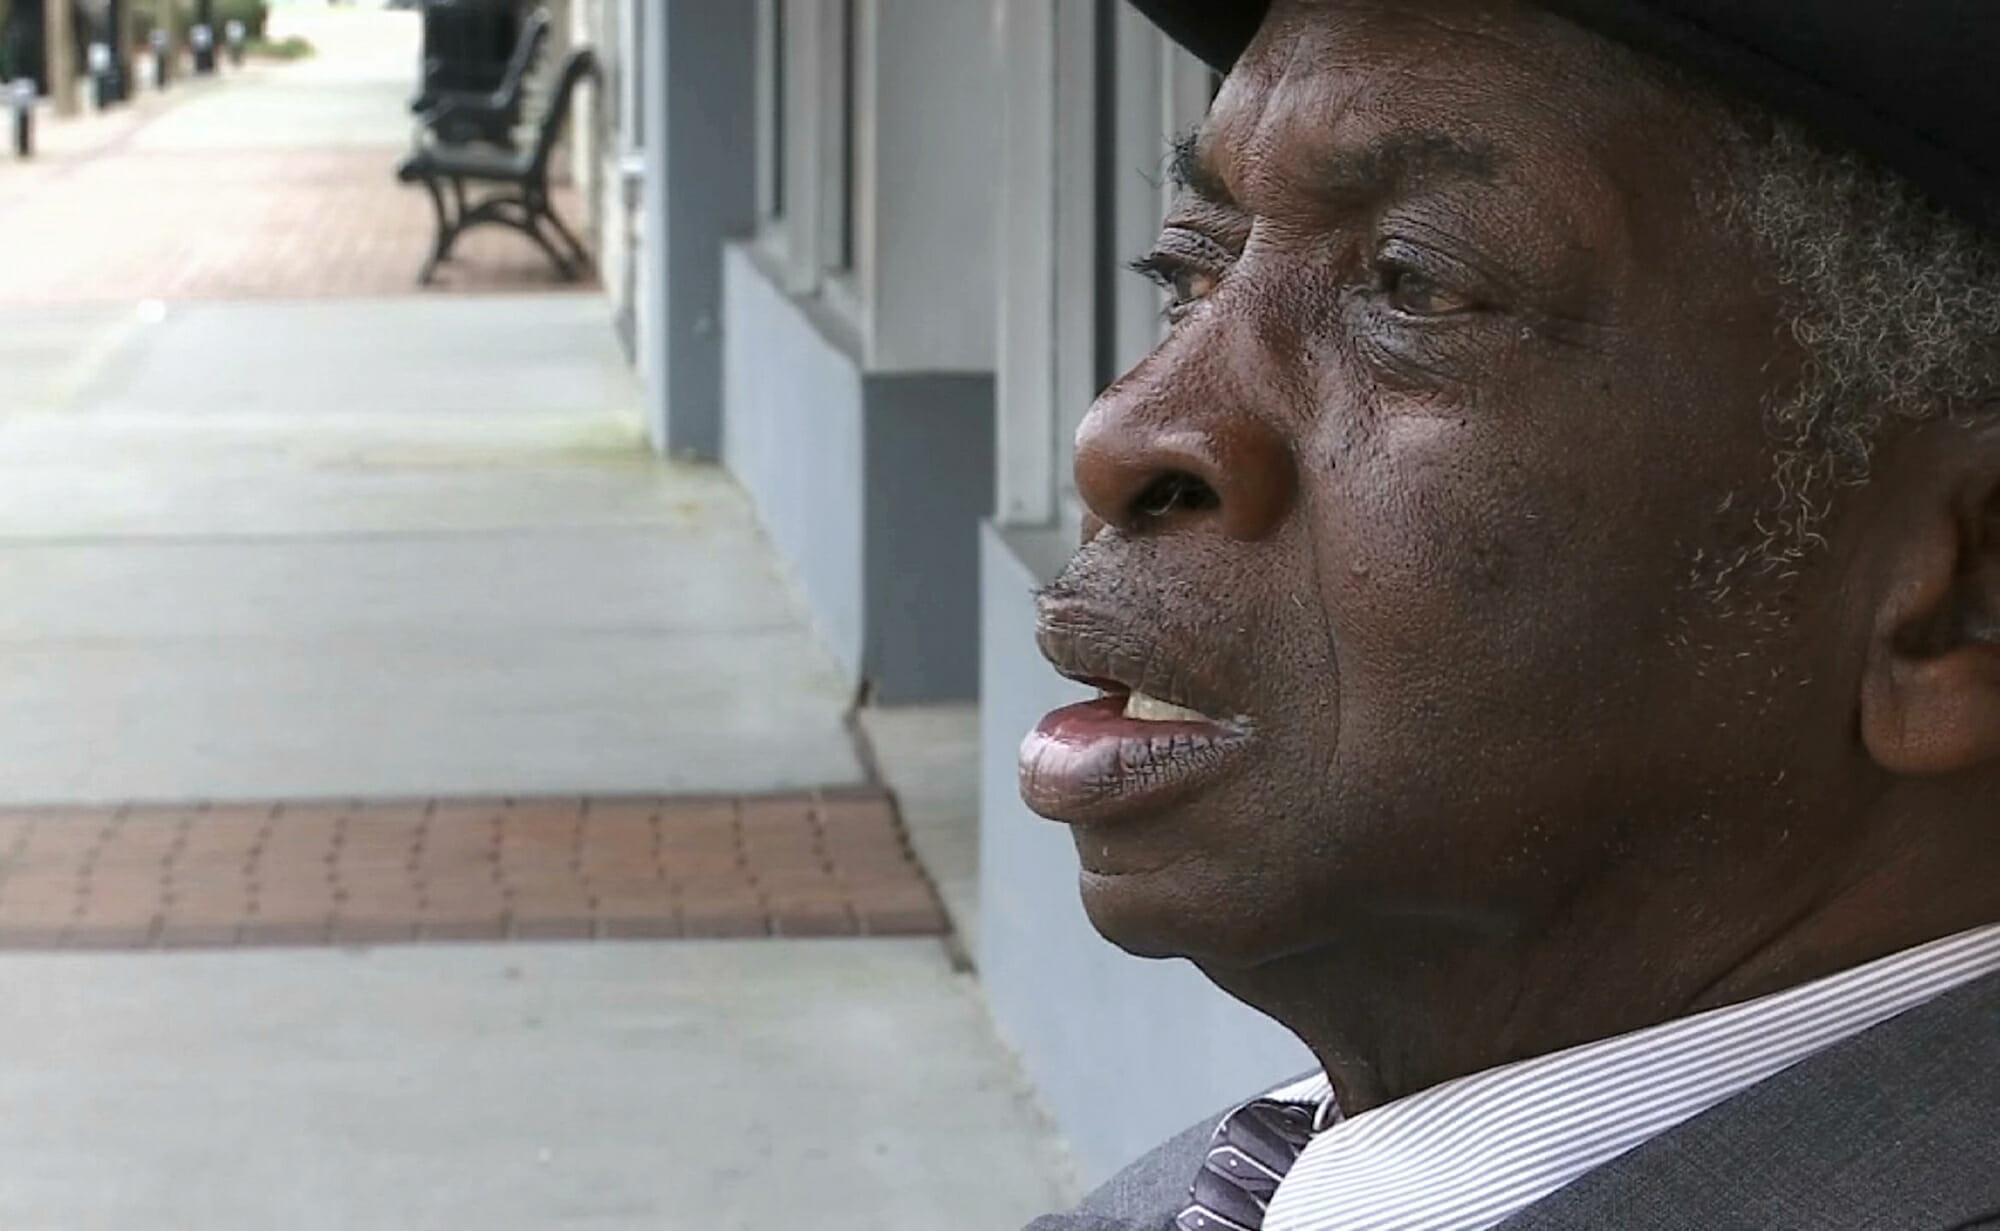 North Carolina Disputed Election Fatigue